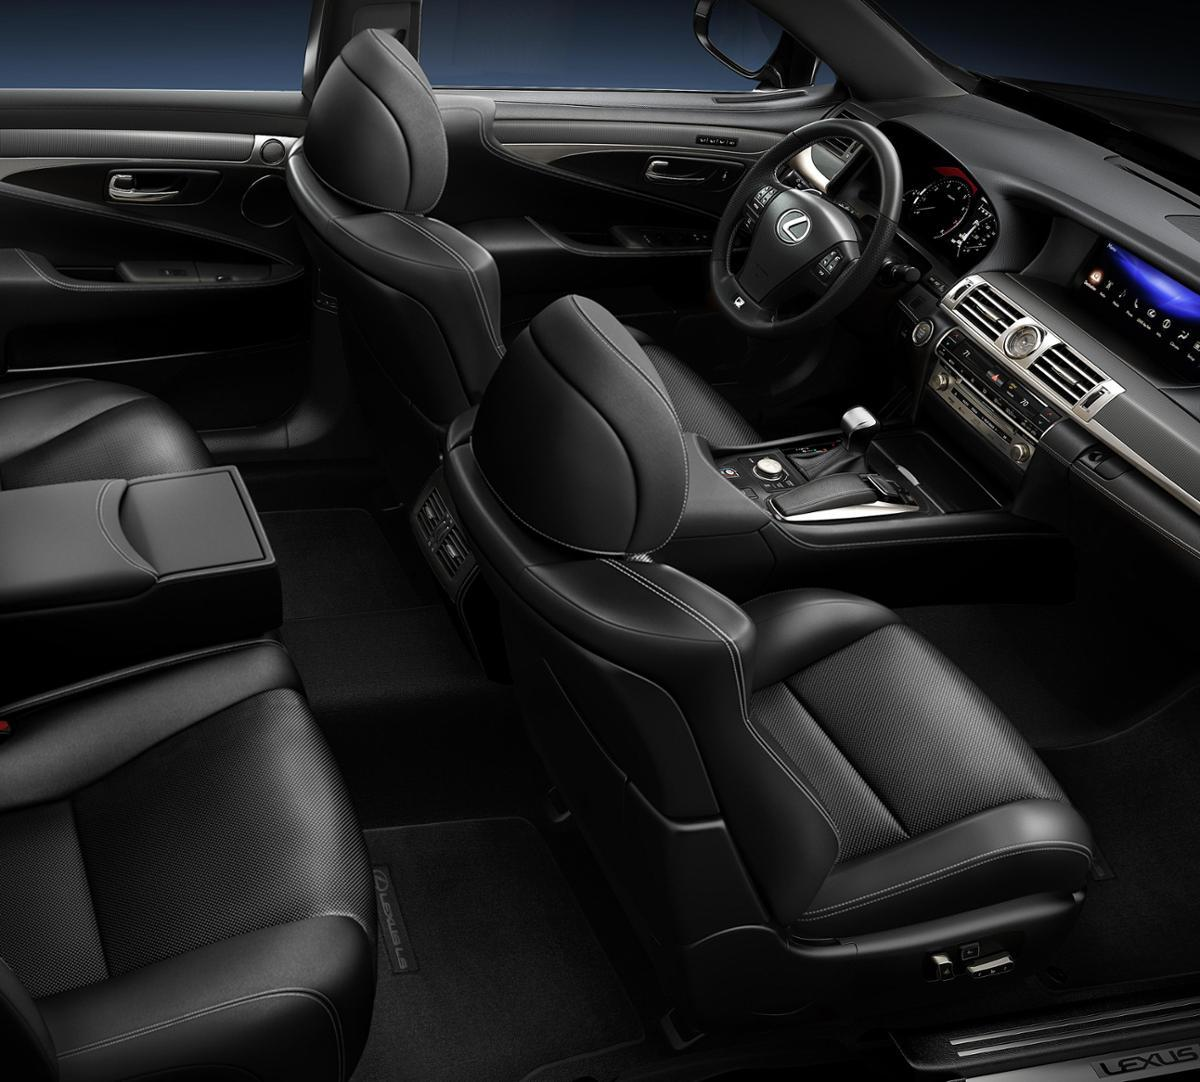 2013 Lexus 460 For Sale: Dallas Certified 2017 Lexus LS 460 Ultra White: Car For